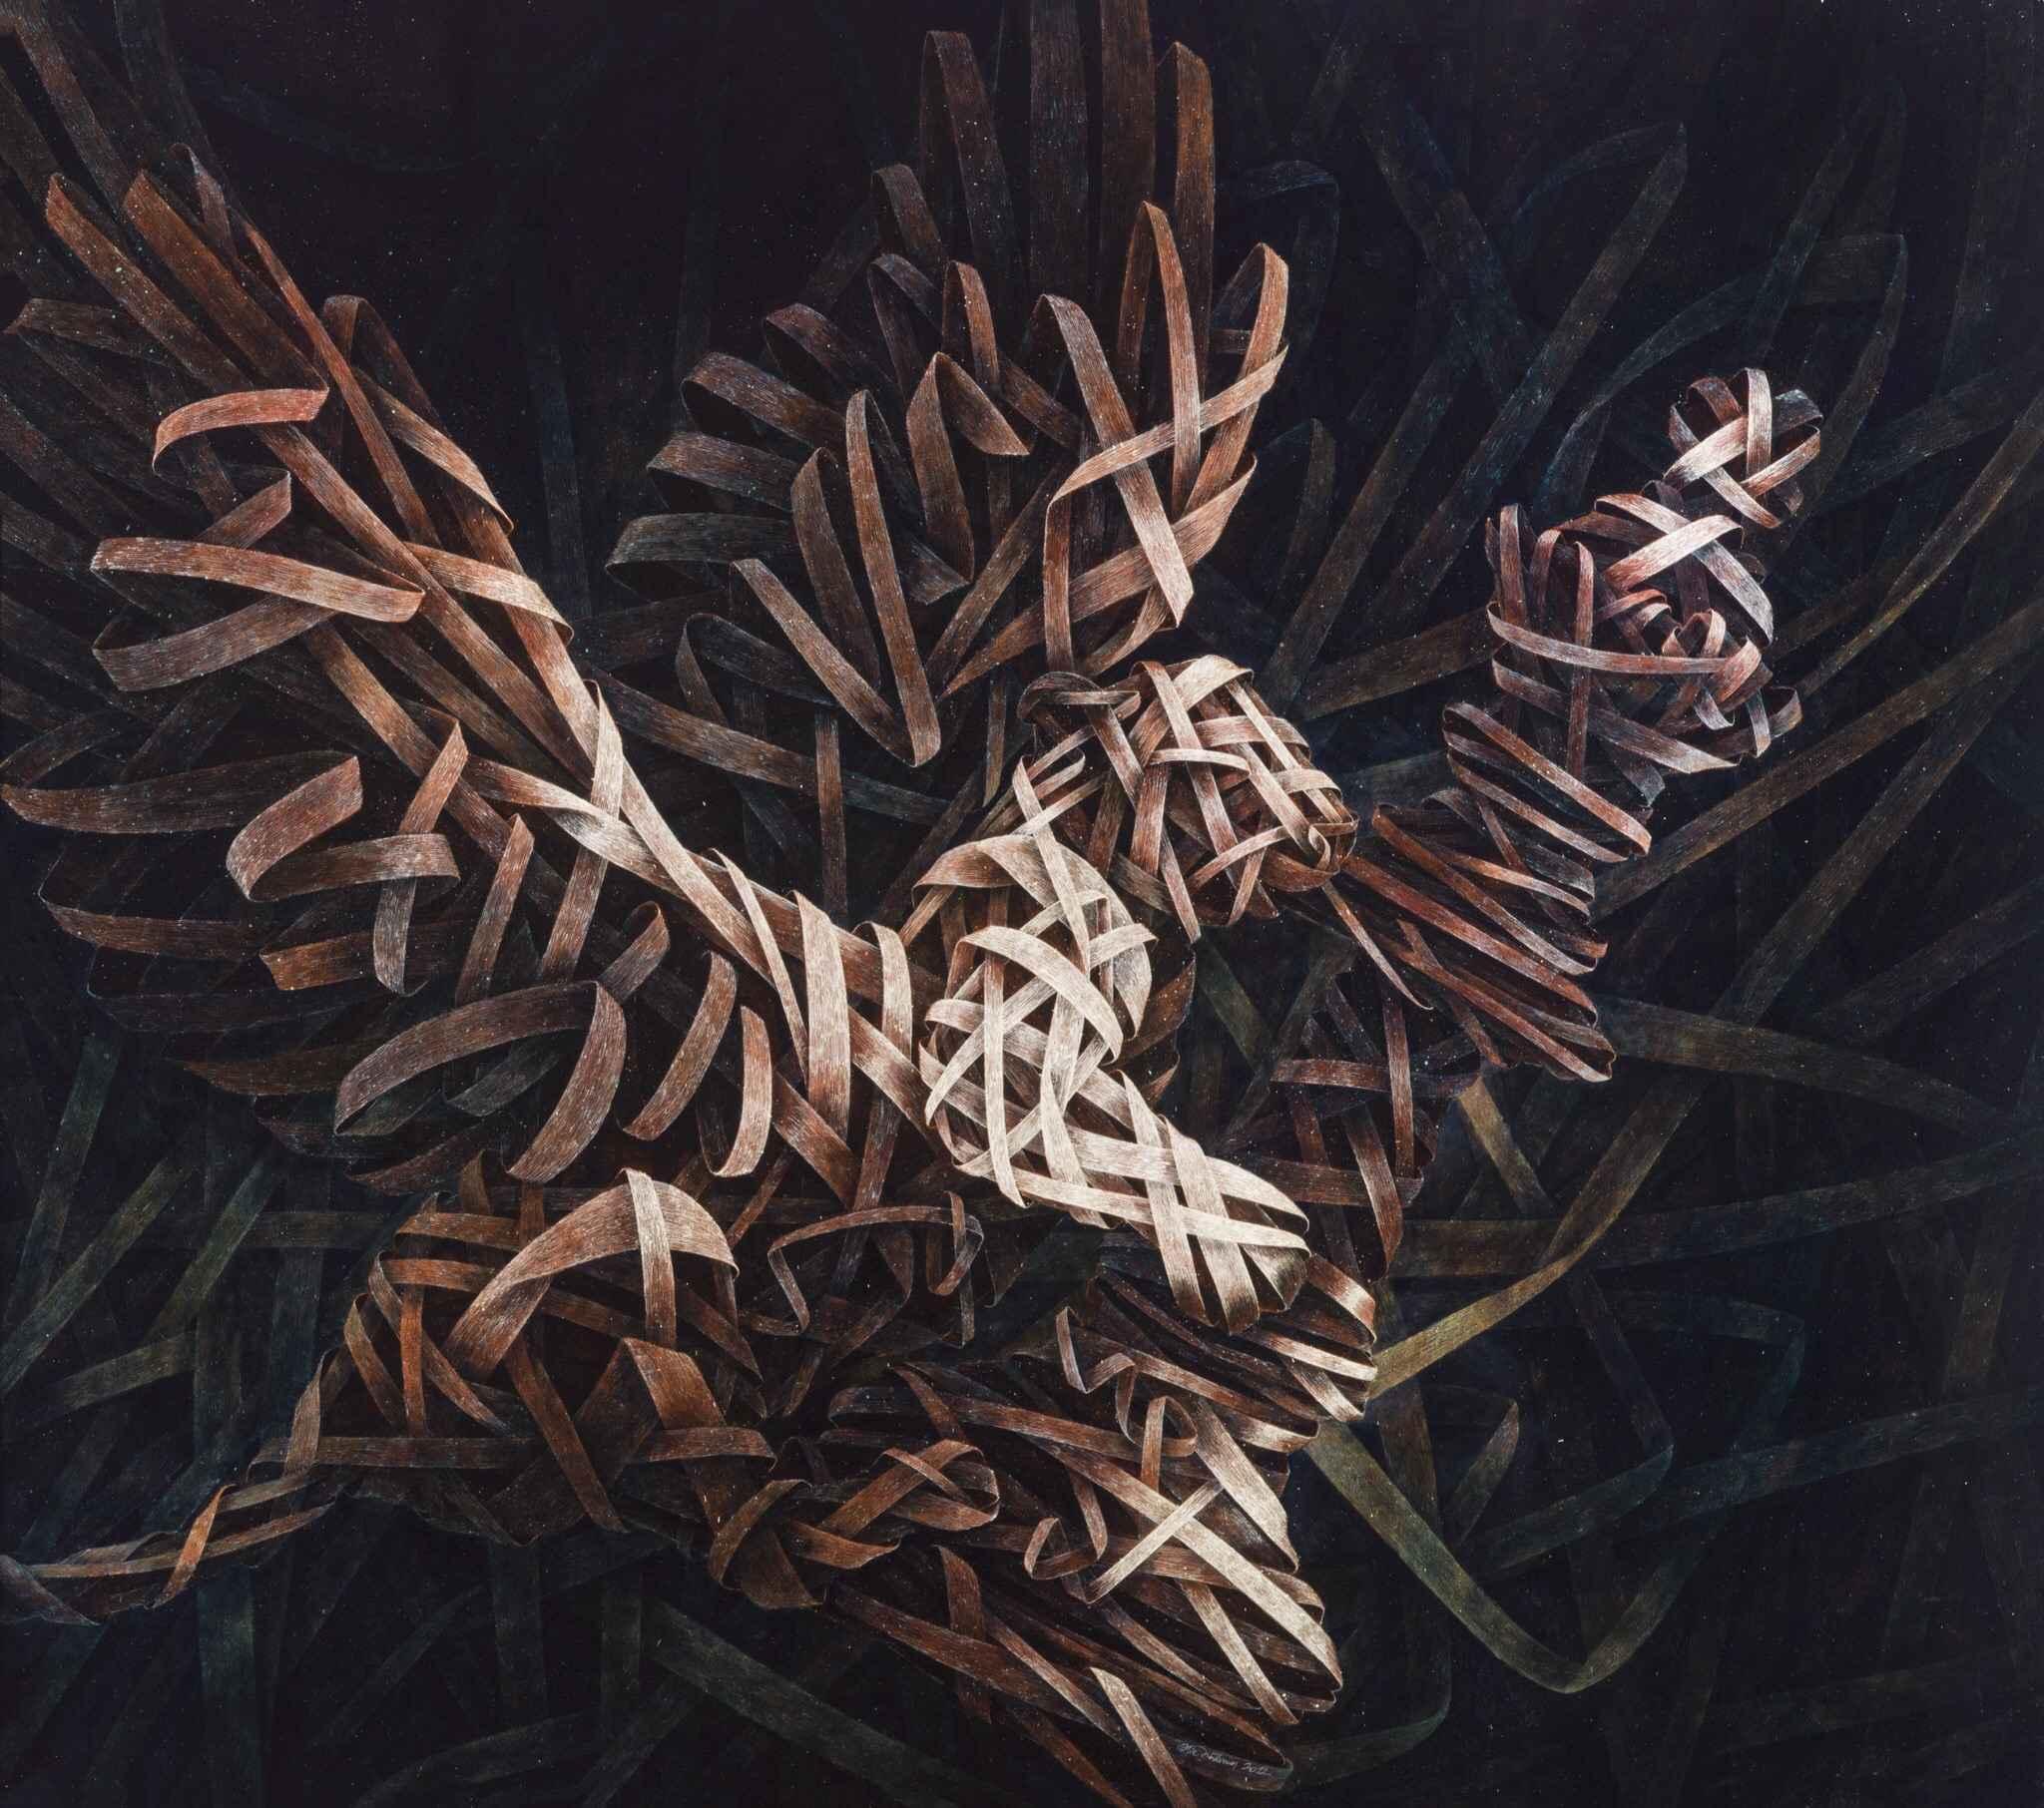 Queen Mirror 2 by  Ilie Vaduva - Masterpiece Online